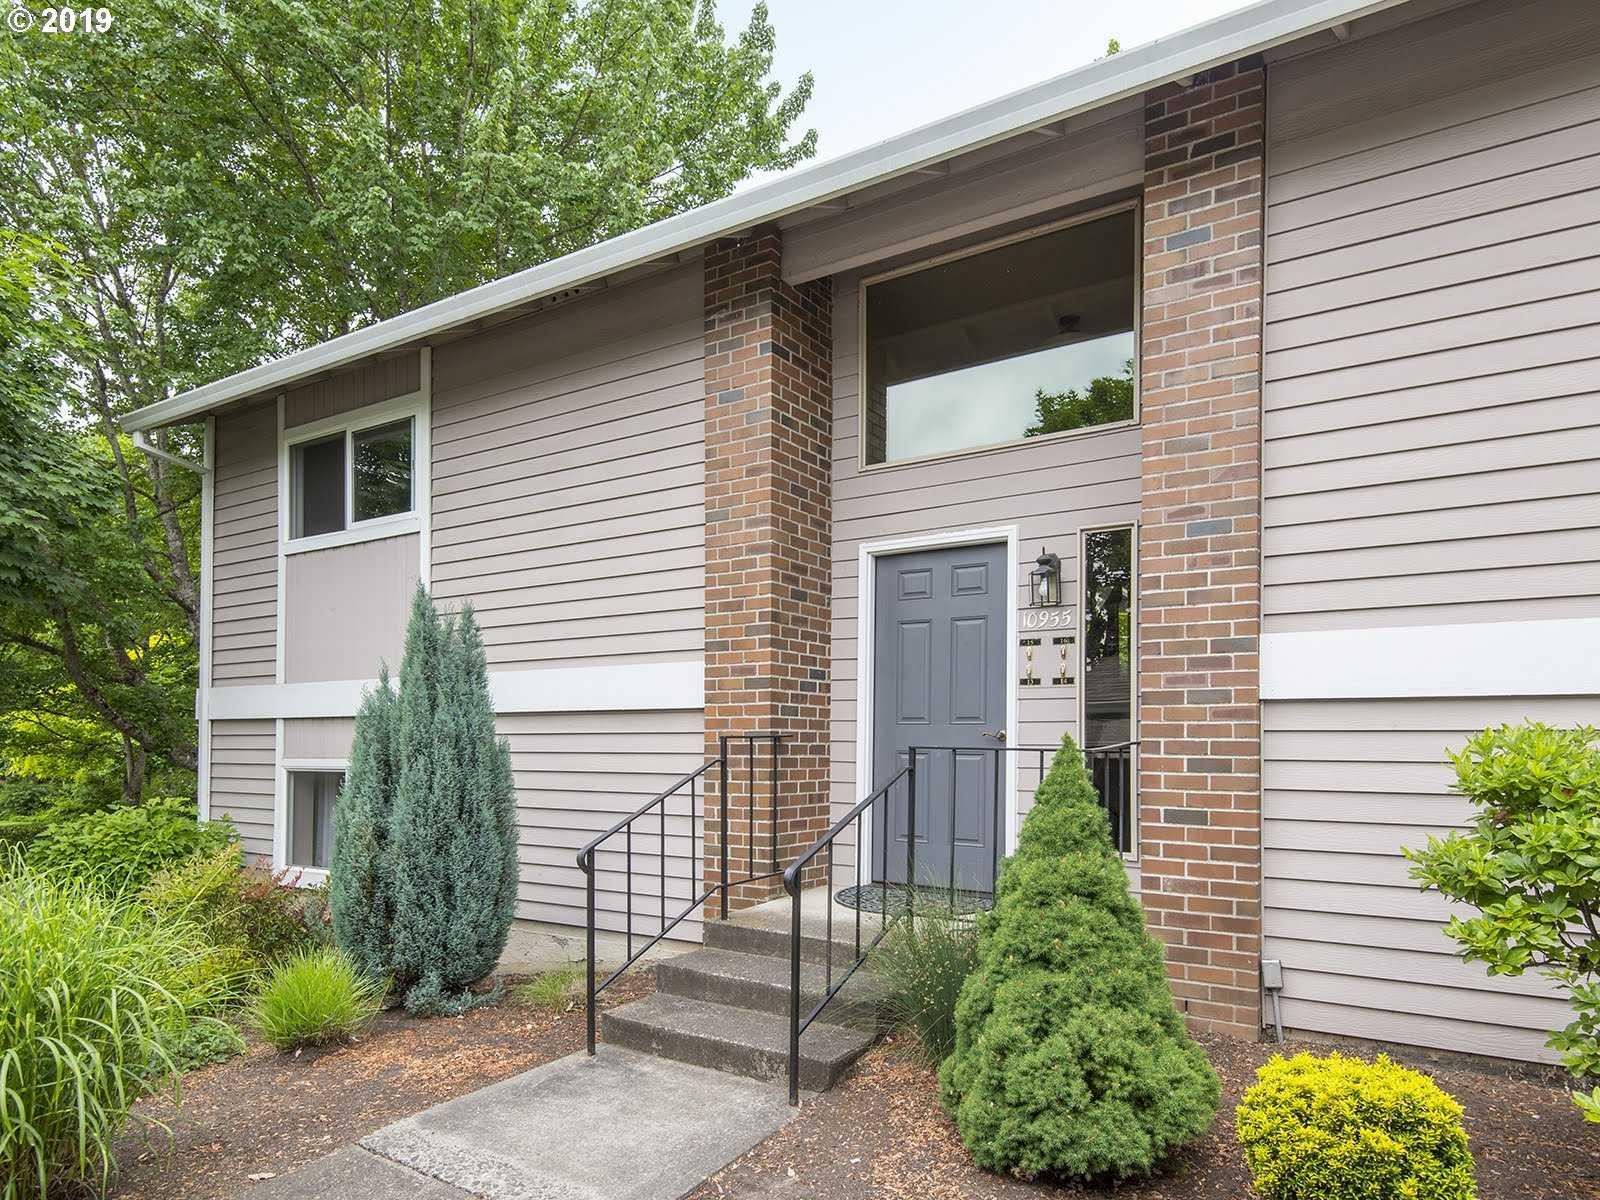 Strange Homes For Sale In Tigard Oregon No Registration Required Download Free Architecture Designs Scobabritishbridgeorg